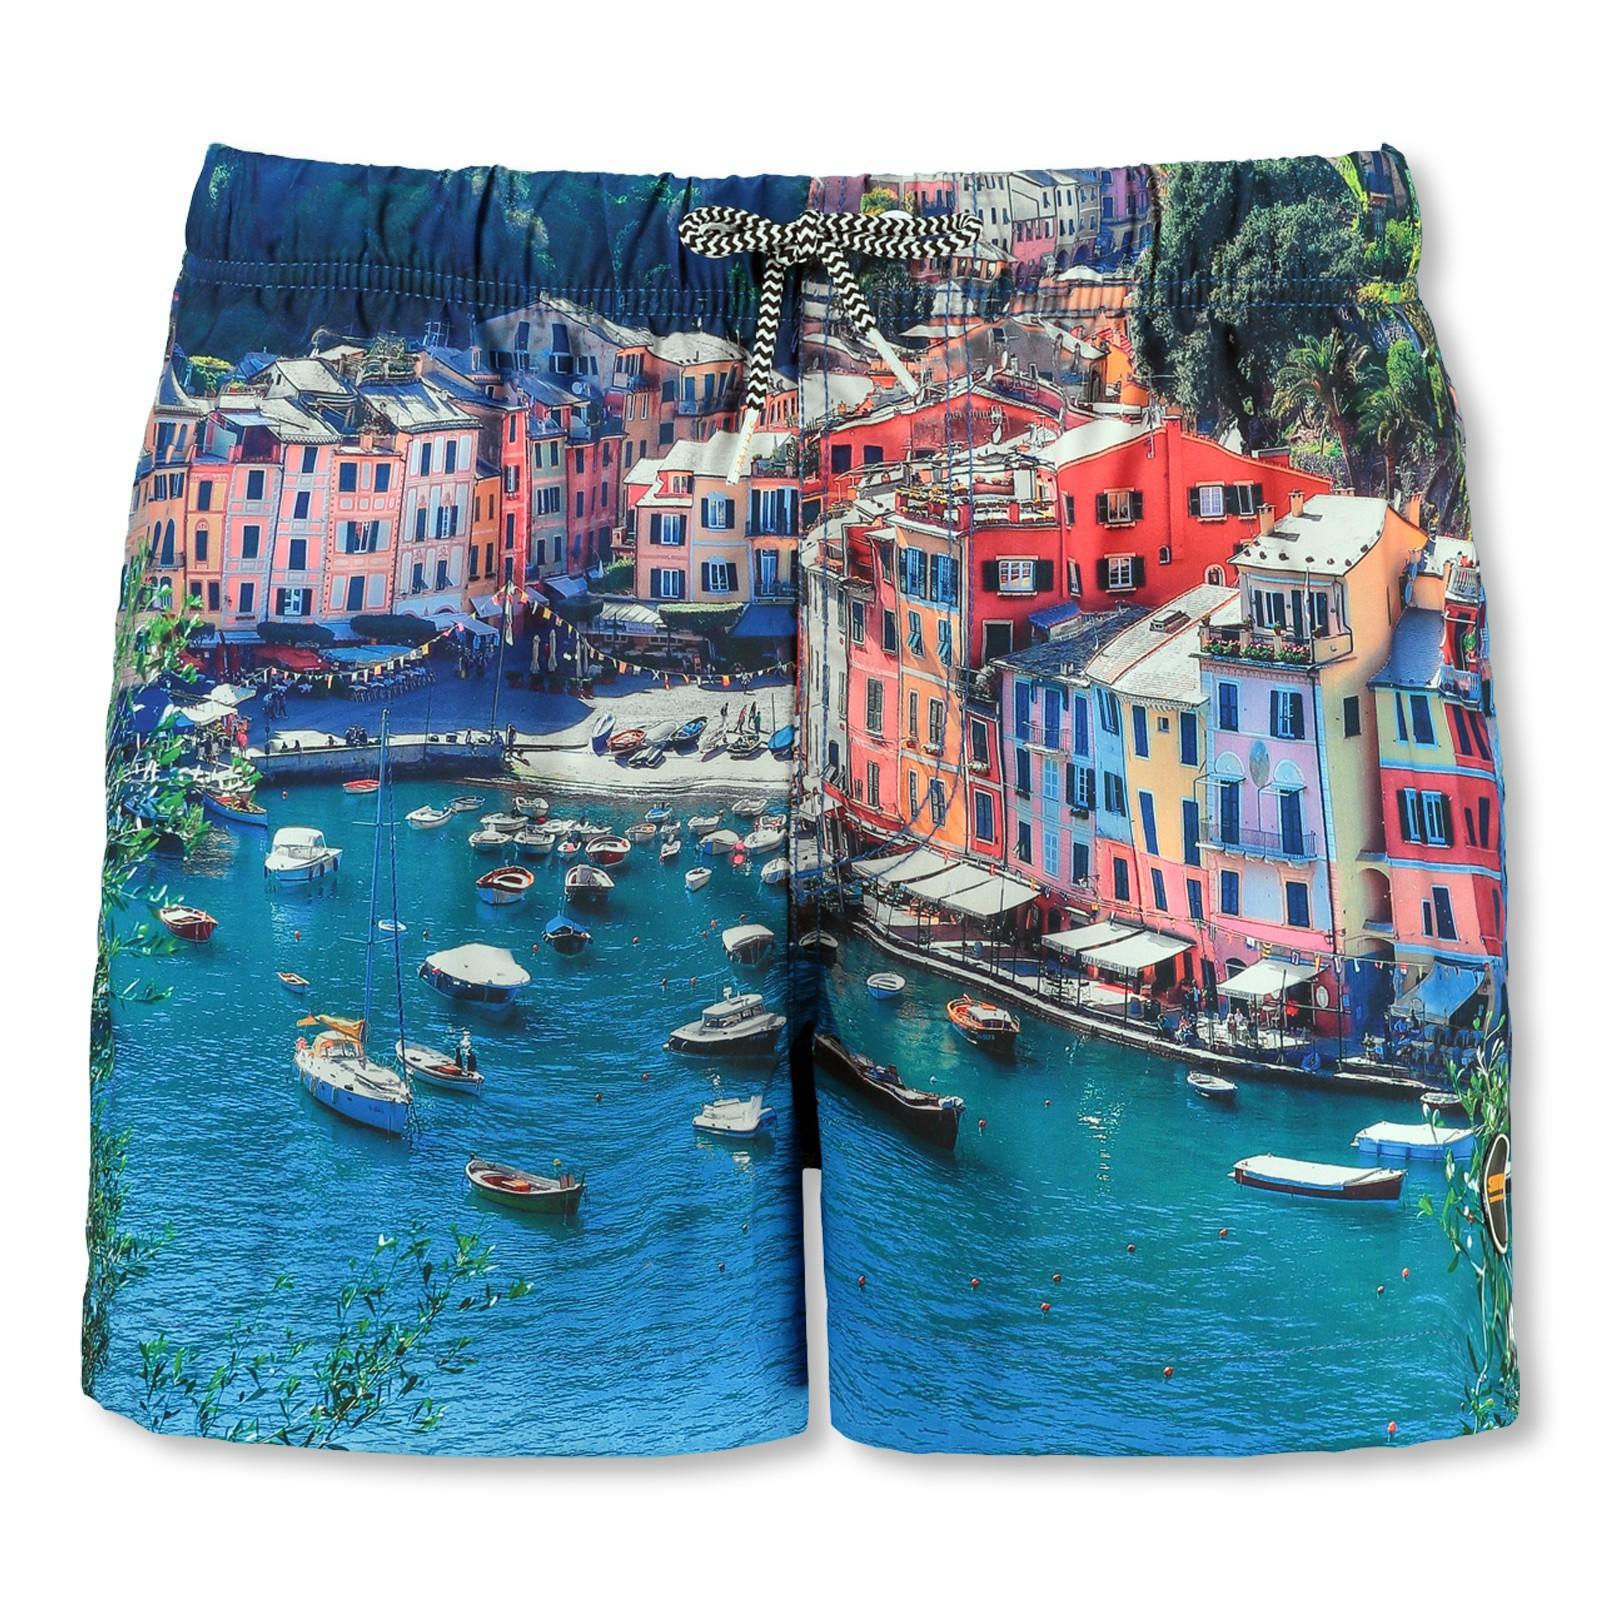 Shiwi Herren Badehose Badeshorts Portofino S M L XL XXL 4172101051 in multi colour